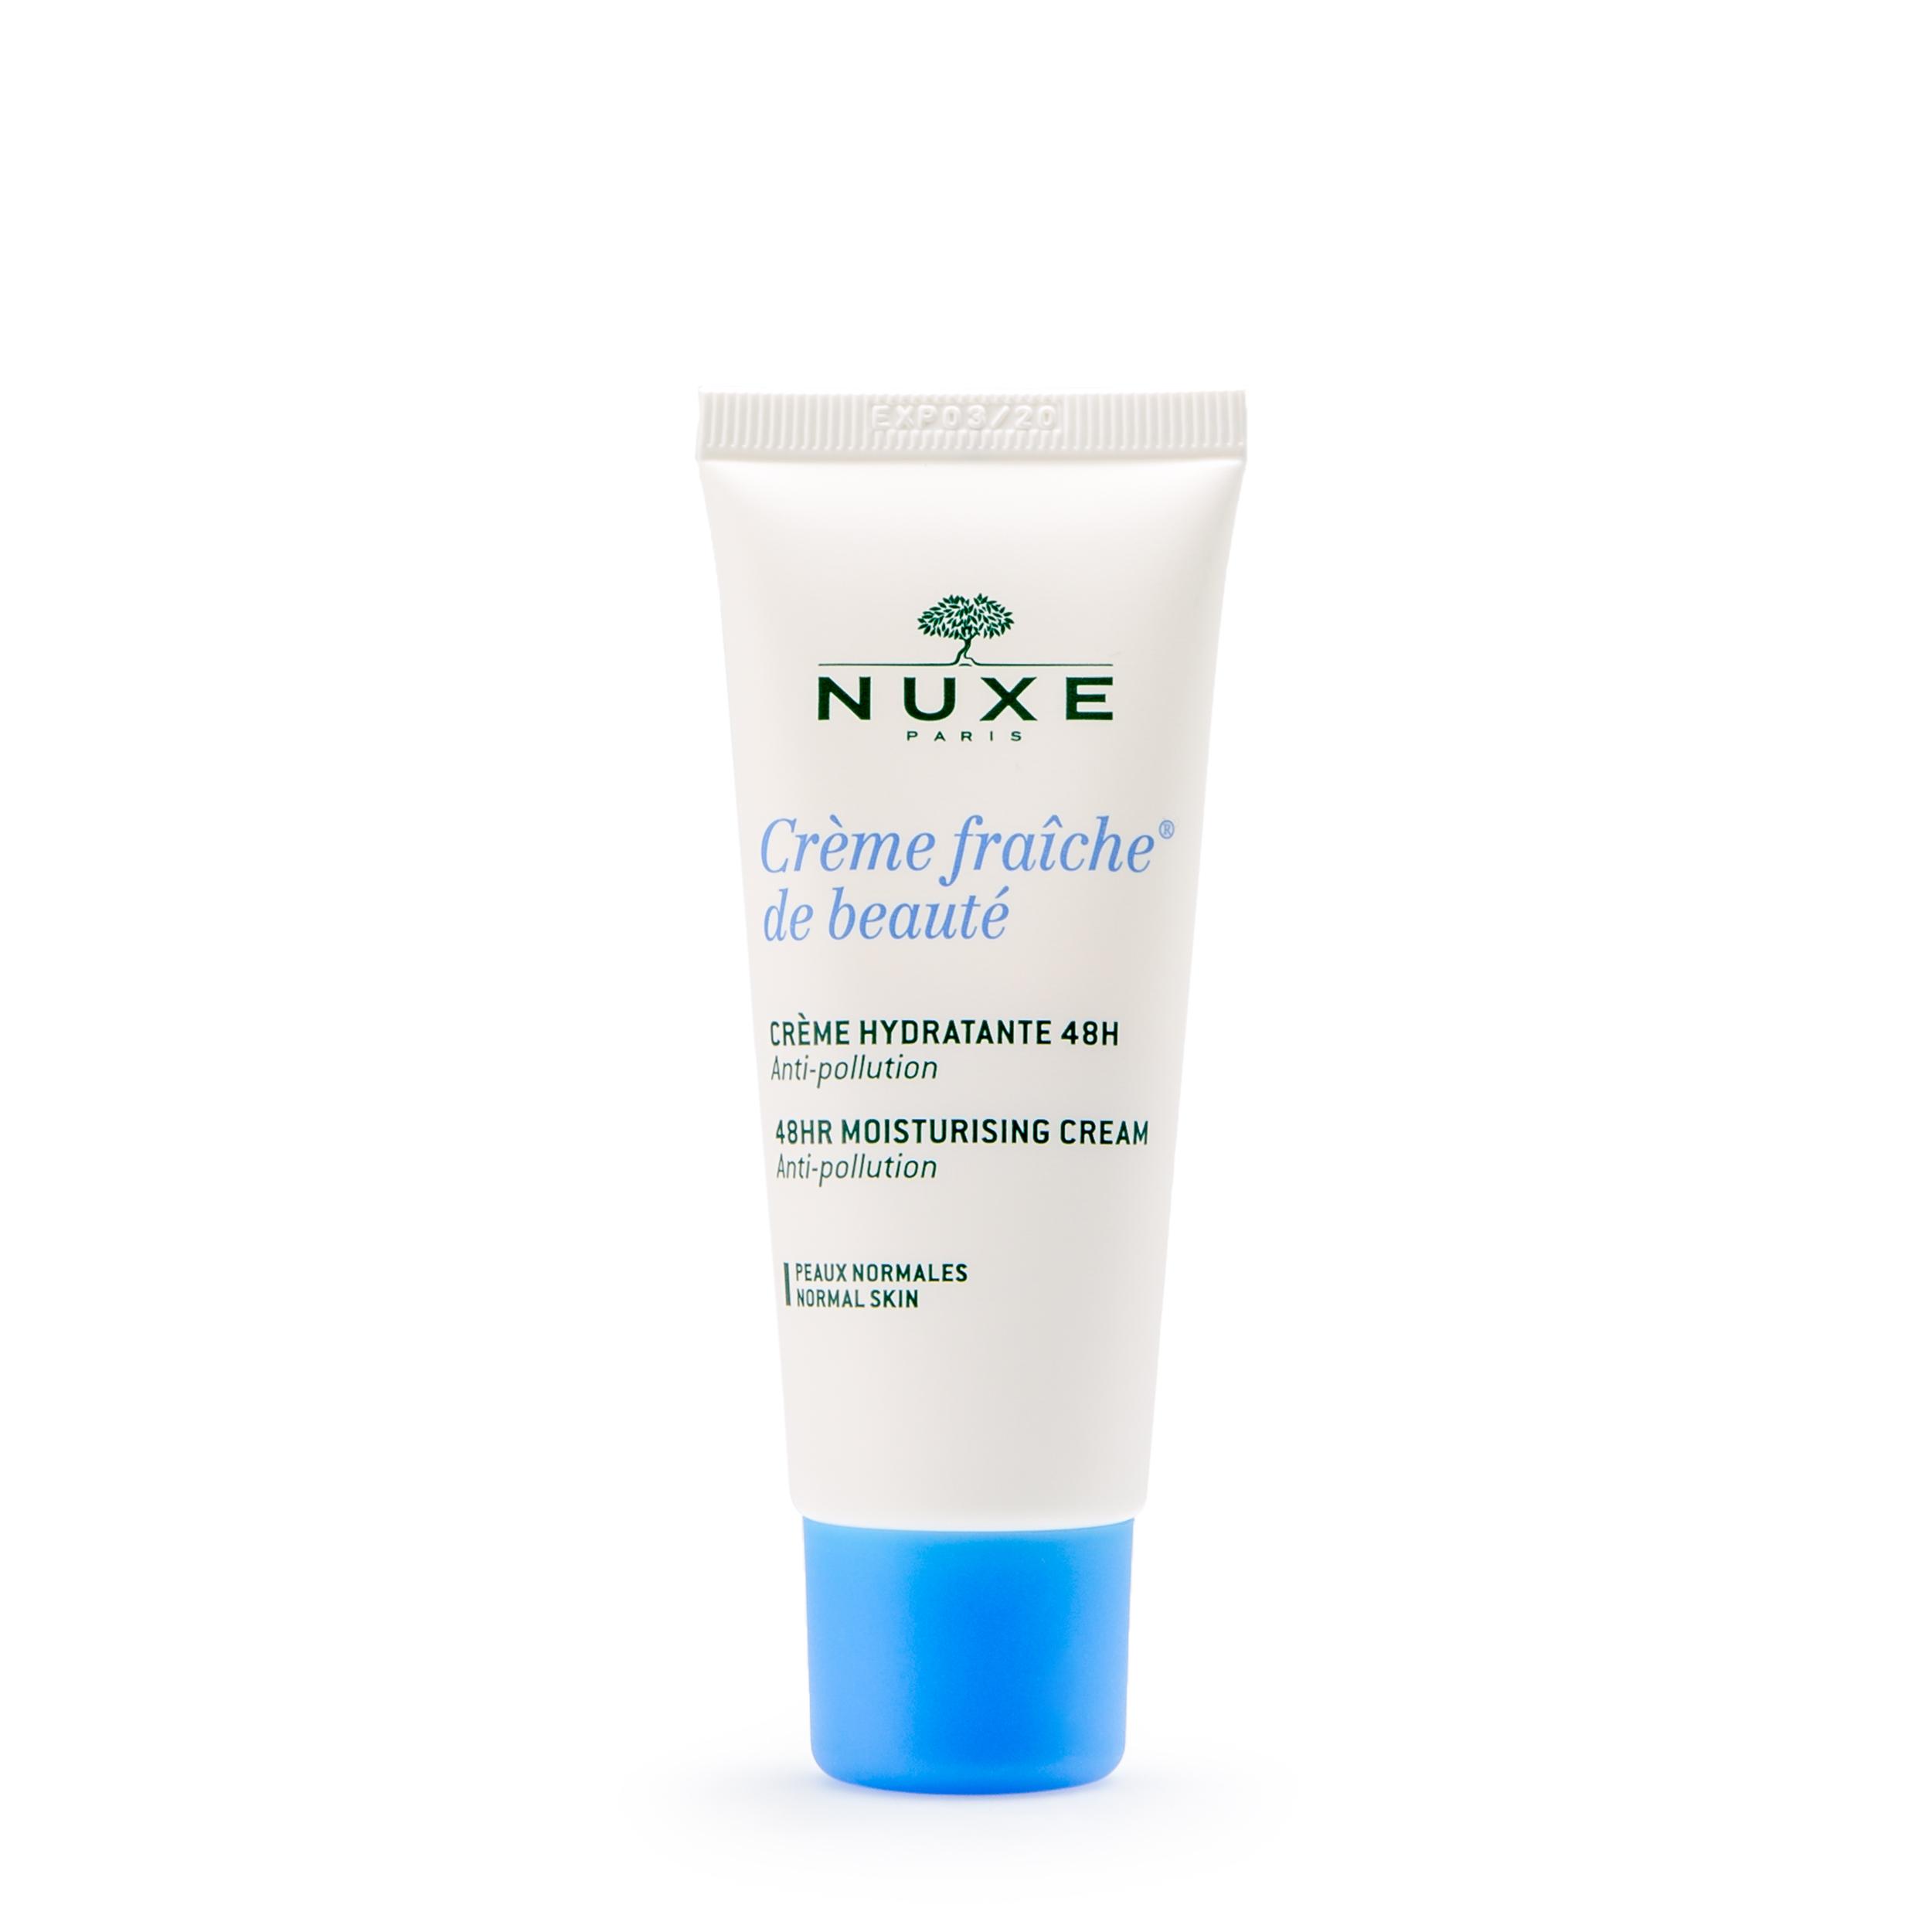 NUXE Увлажняющий крем для лица 48 часов «Crème fraiche de beaute» 30 мл